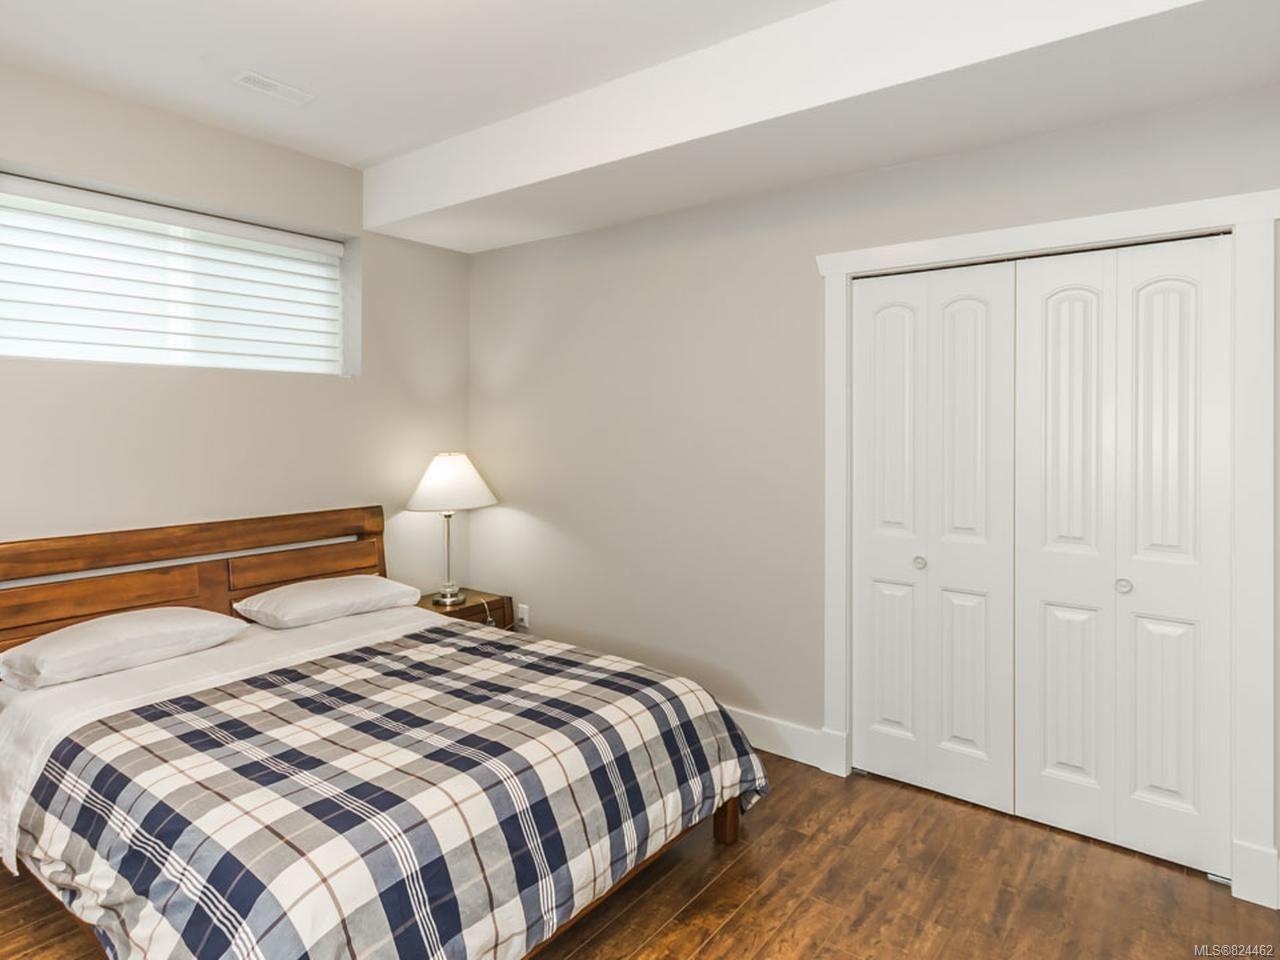 Photo 20: Photos: 3864 Gulfview Dr in NANAIMO: Na North Nanaimo House for sale (Nanaimo)  : MLS®# 824462